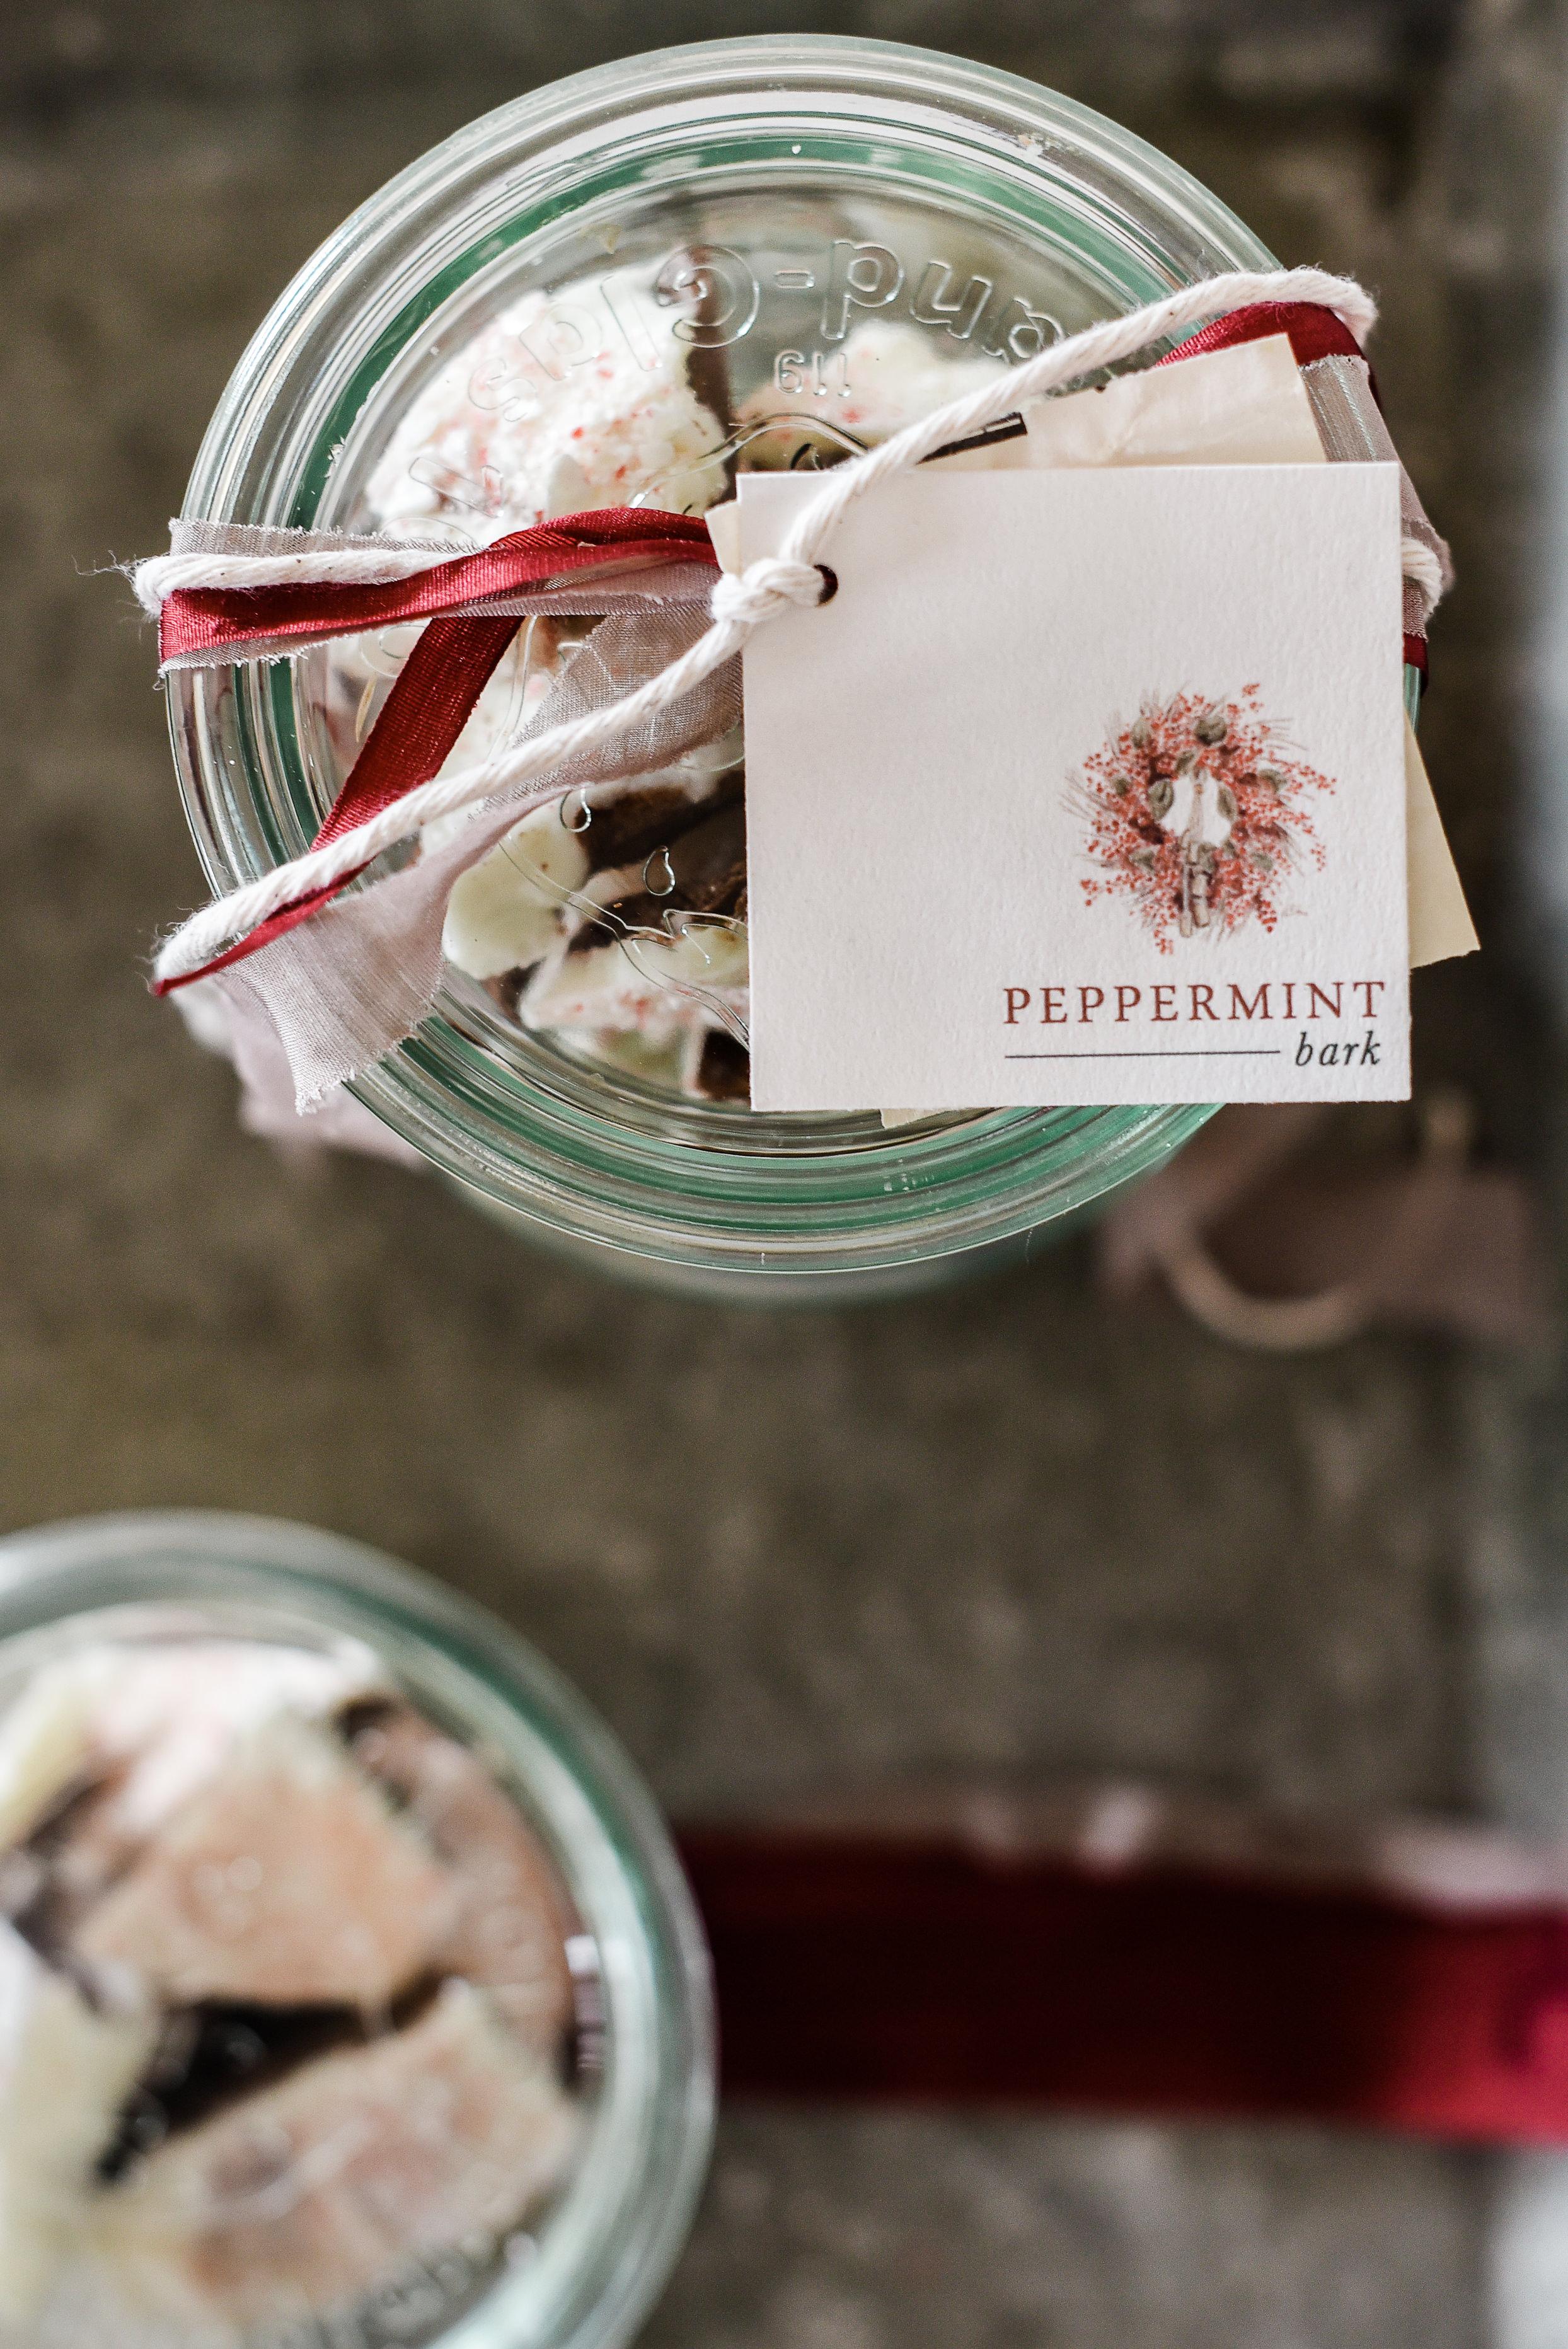 Make this homemade peppermint bark this holiday season as an easy Christmas treat or DIY Christmas gift! boxwoodavenue.com #christmasbaking #ediblechristmasgift